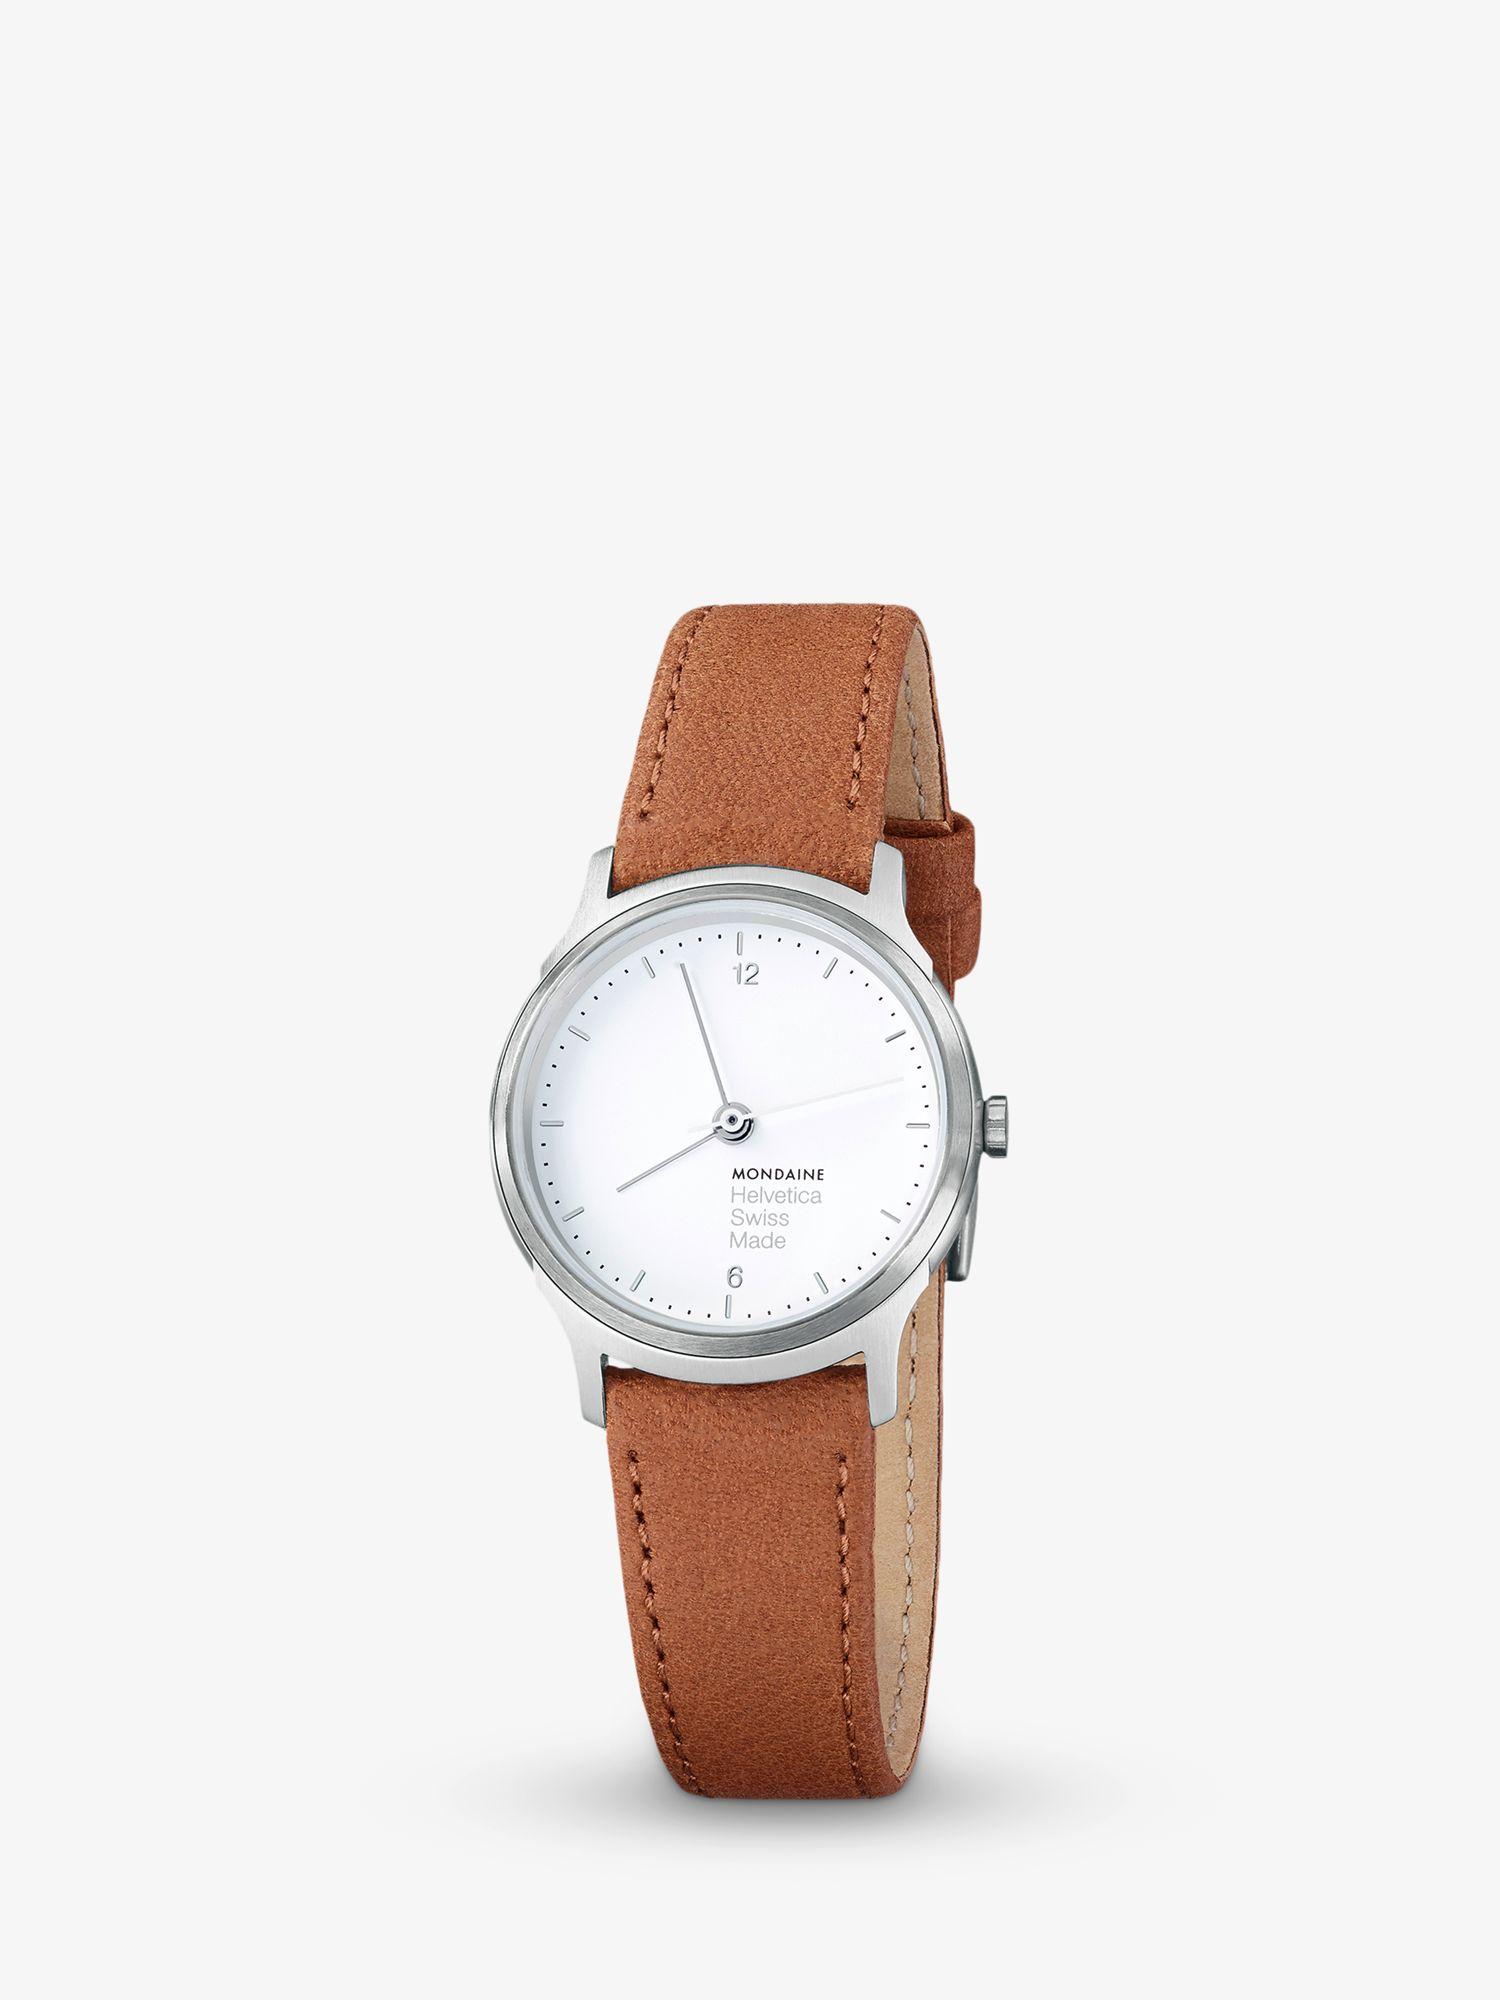 Mondaine Mondaine MH1L1110LG Unisex Helvetica Leather Strap Watch, Brown/White